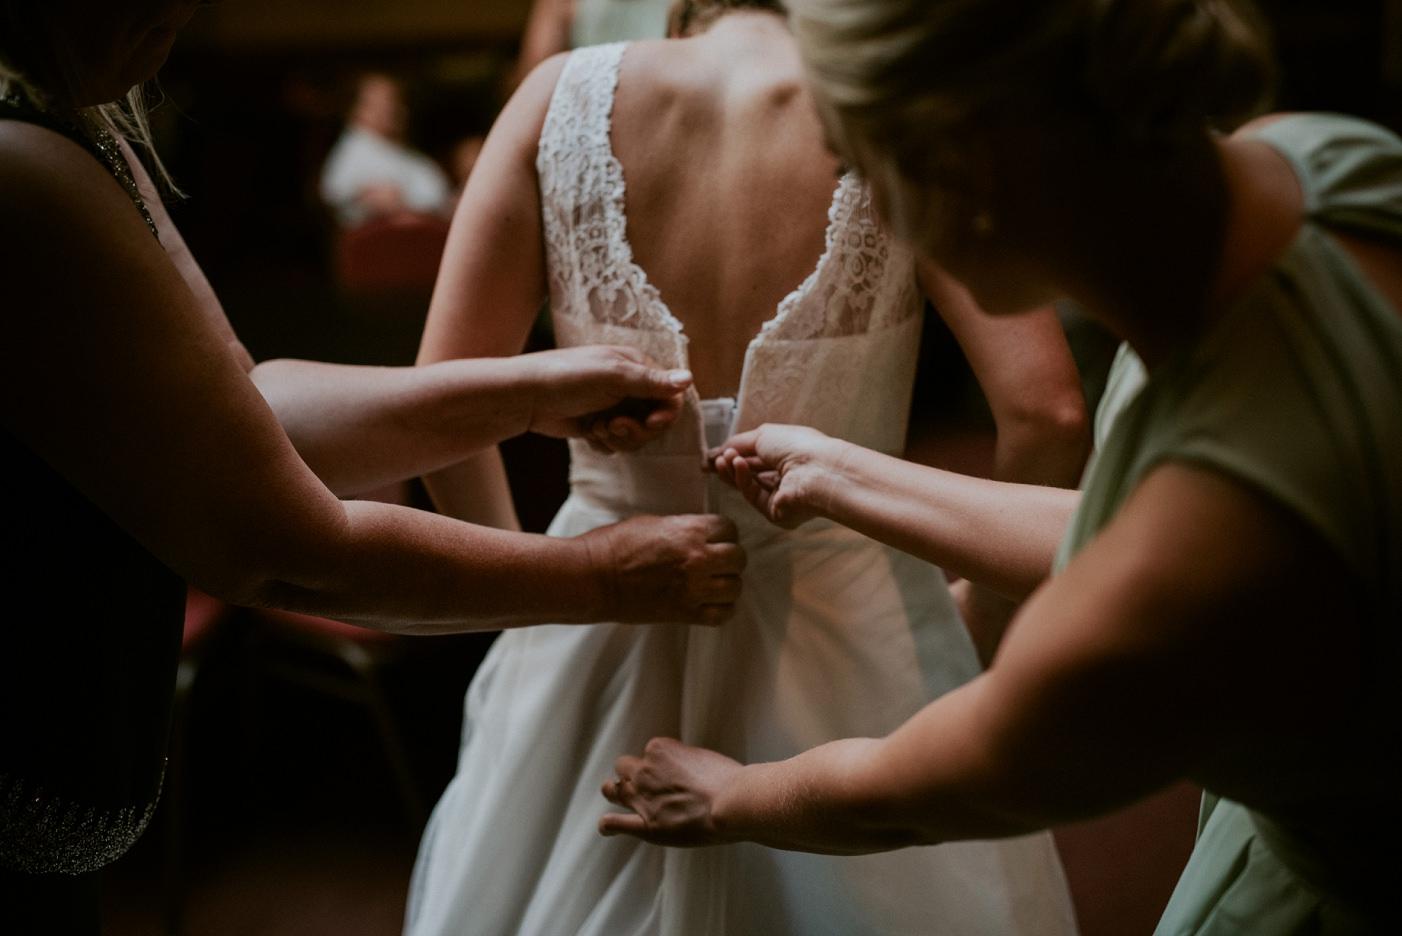 Getting Ready photos in a Church basement - La Crosse WI WEDDING PHOTOGRAPHER